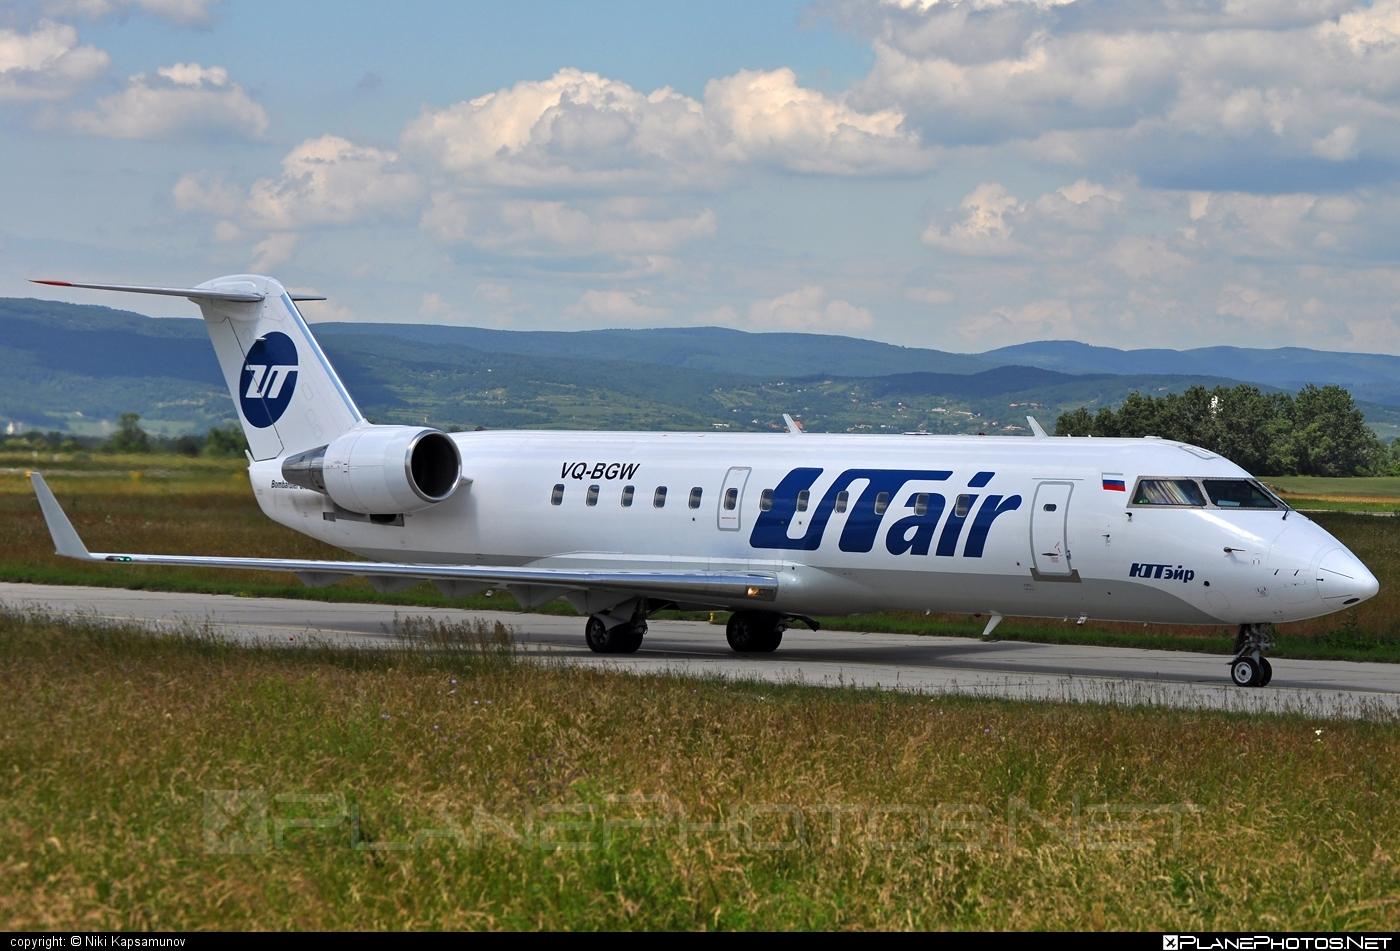 Bombardier CRJ200LR - VQ-BGW operated by UTair Aviation #bombardier #crj200 #crj200lr #utair #utairaviation